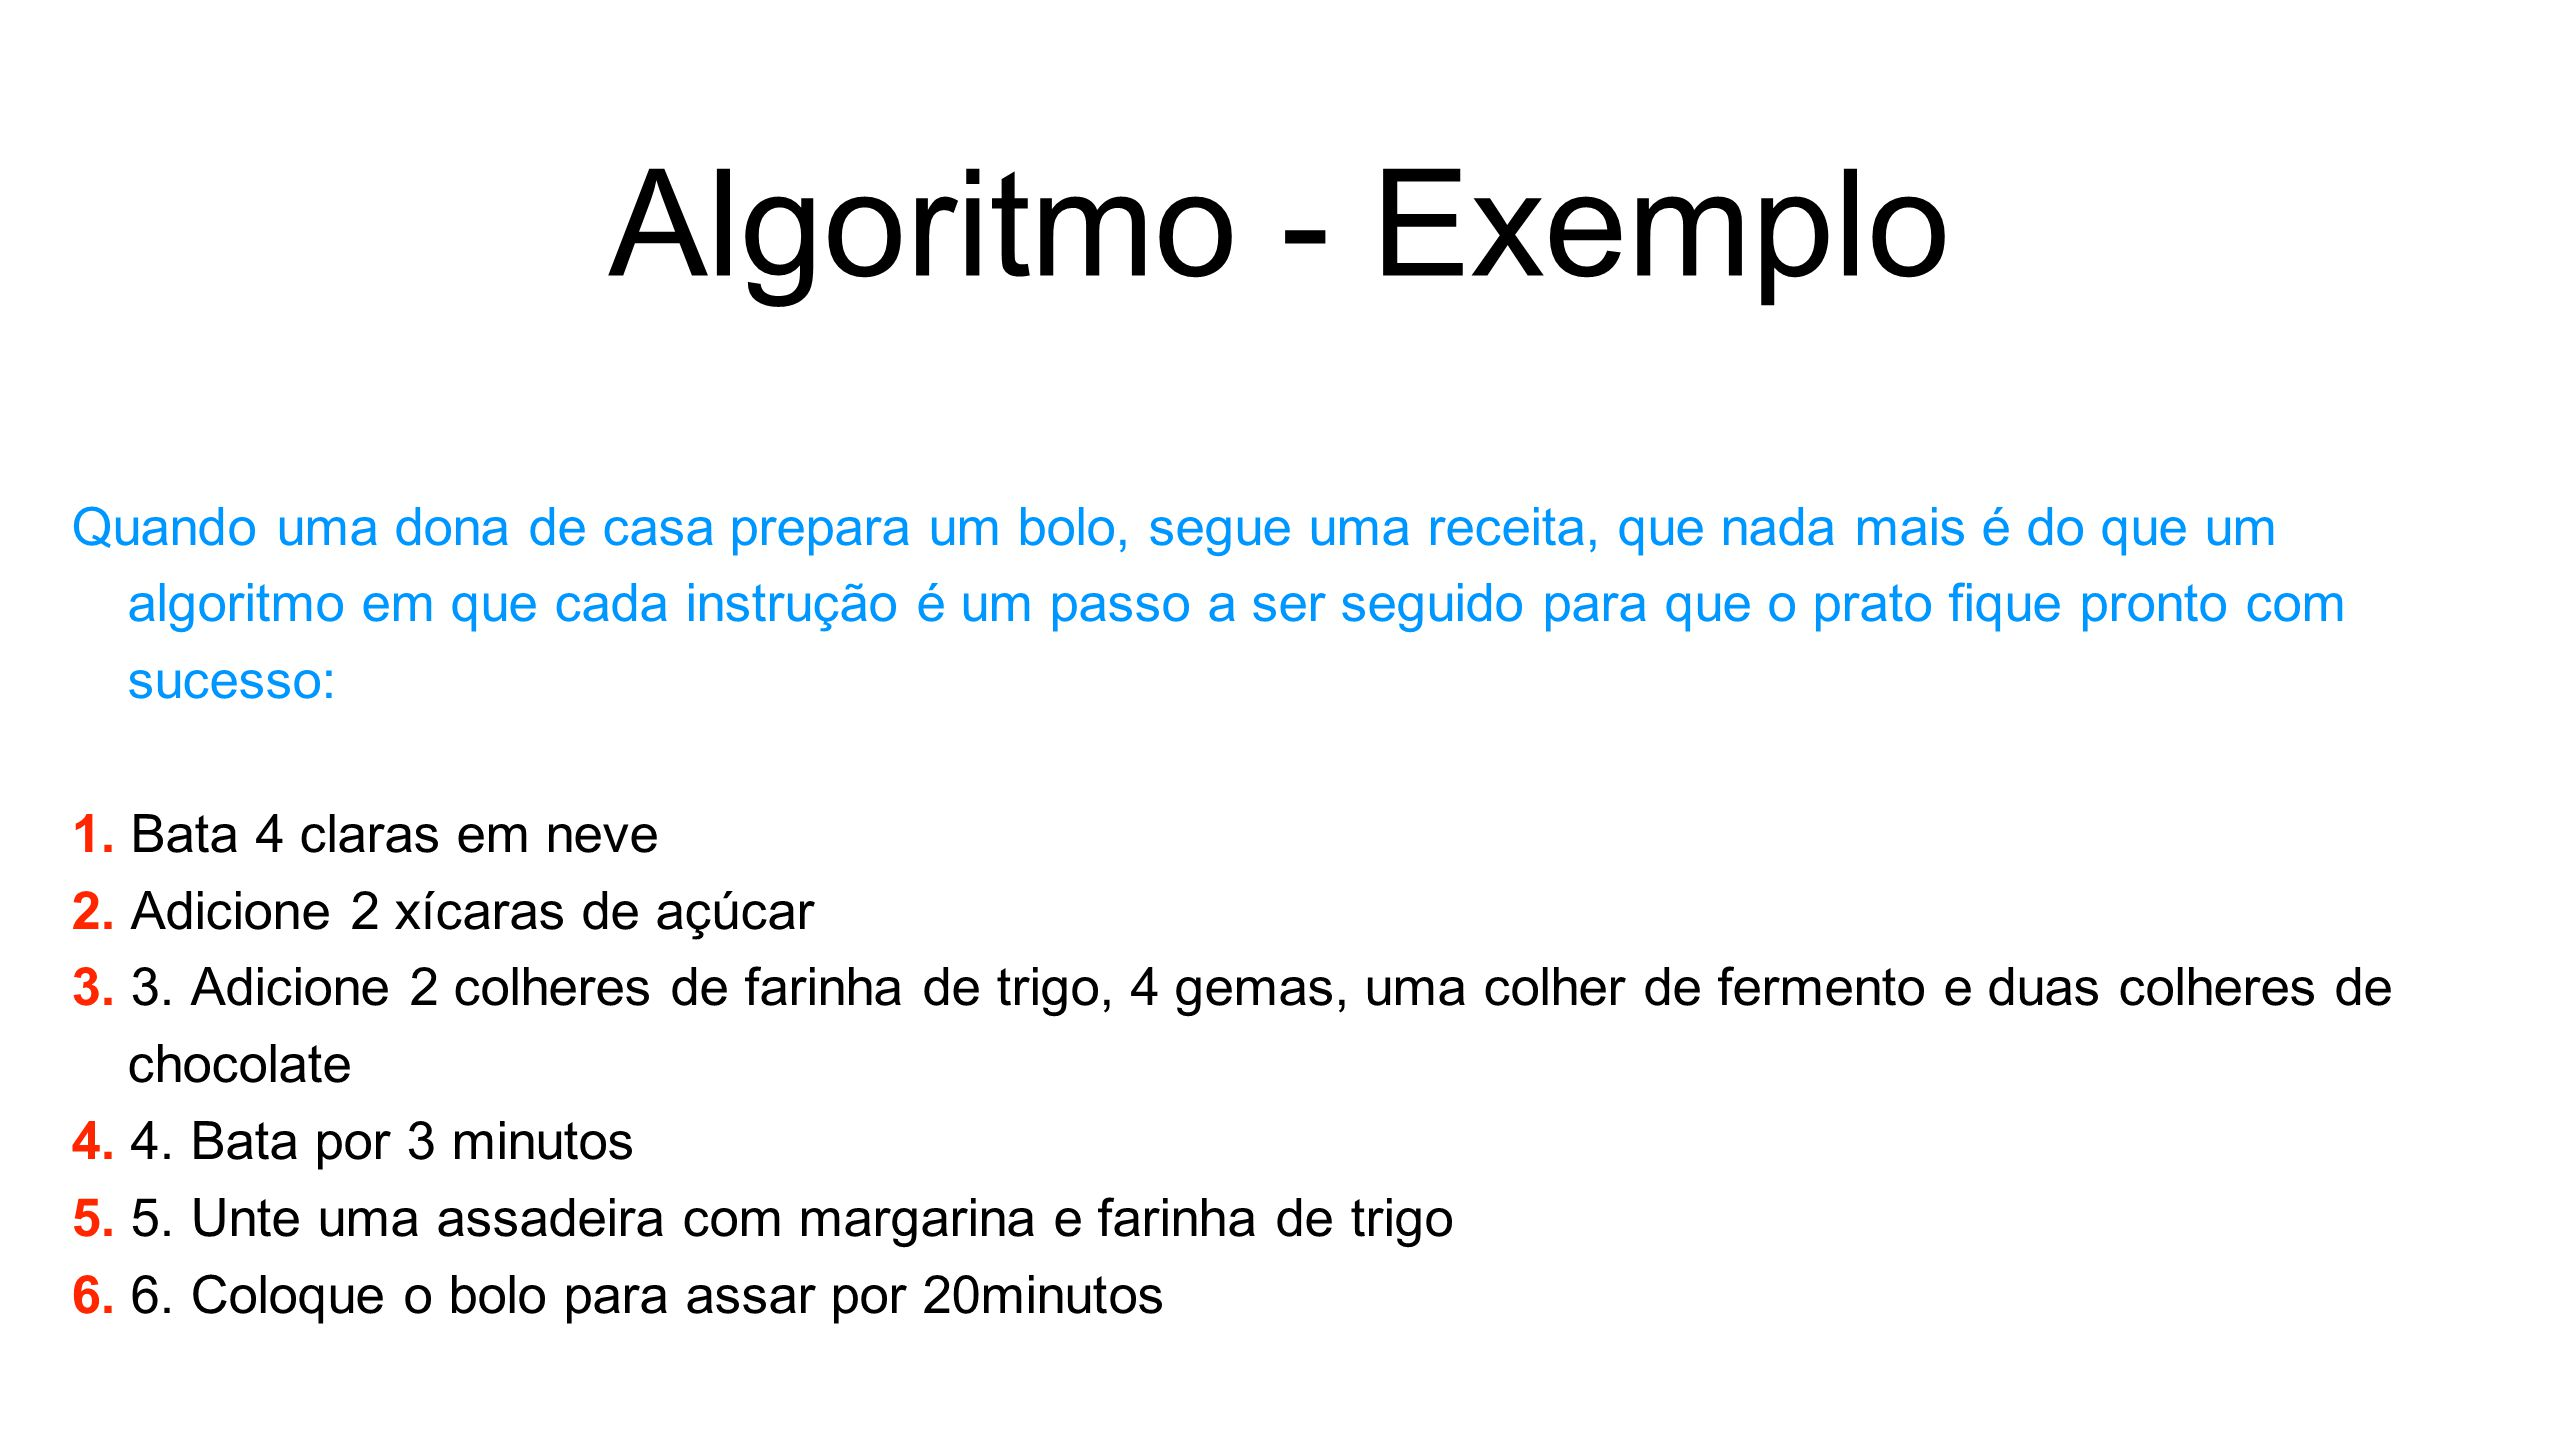 Algoritmo - Exemplo